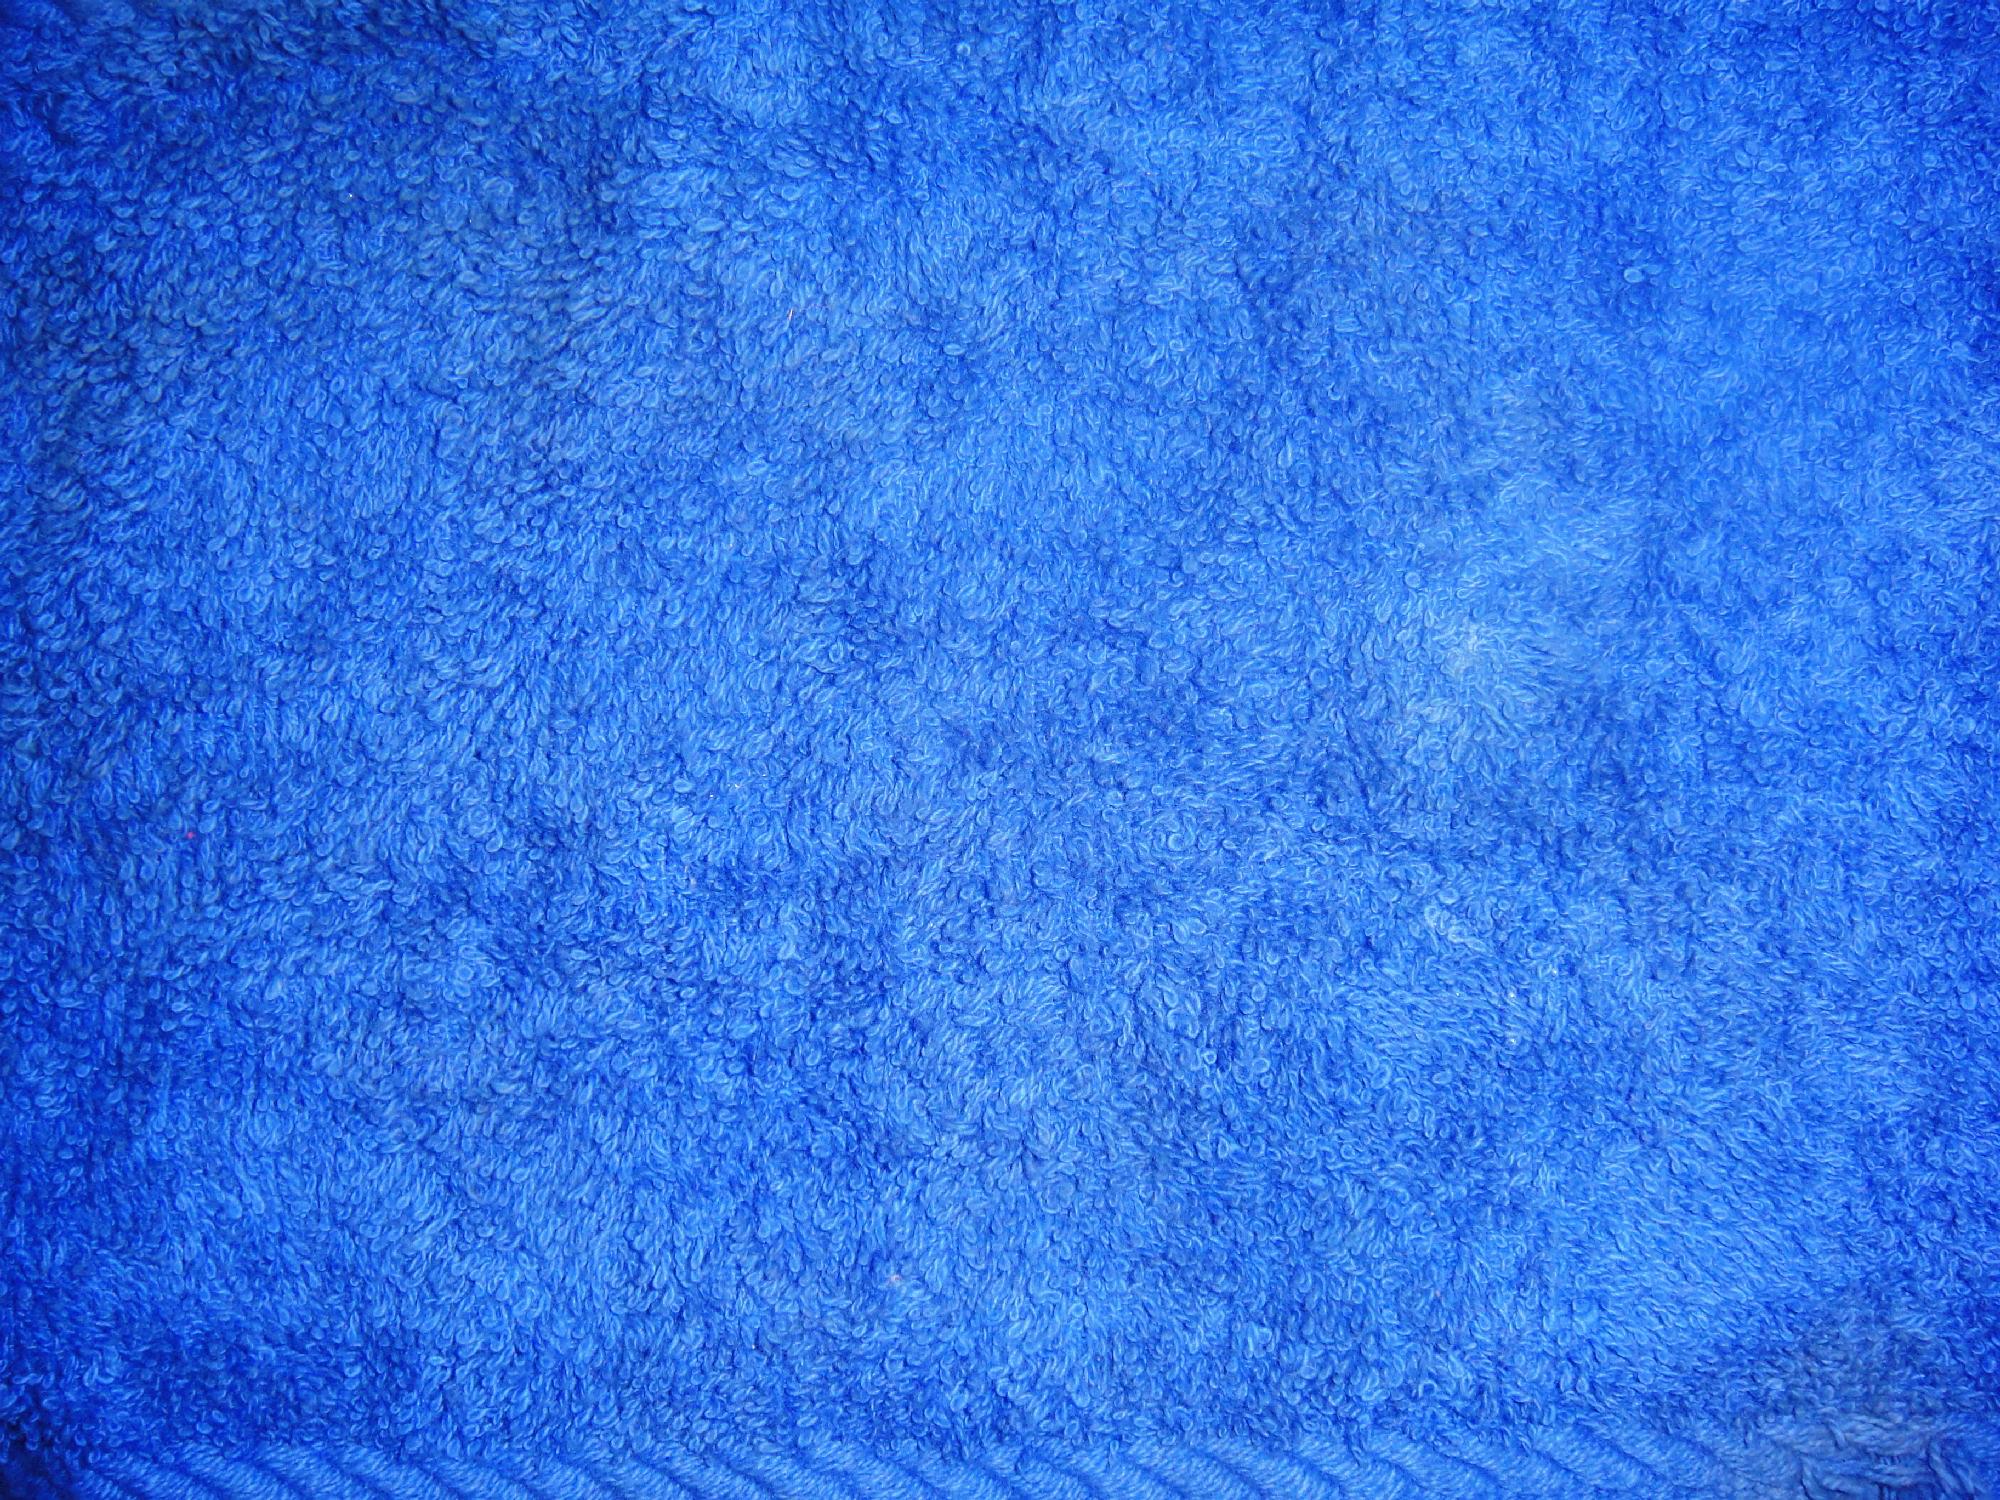 Blue rough fabric, Antique, Blank, Blue, Element, HQ Photo